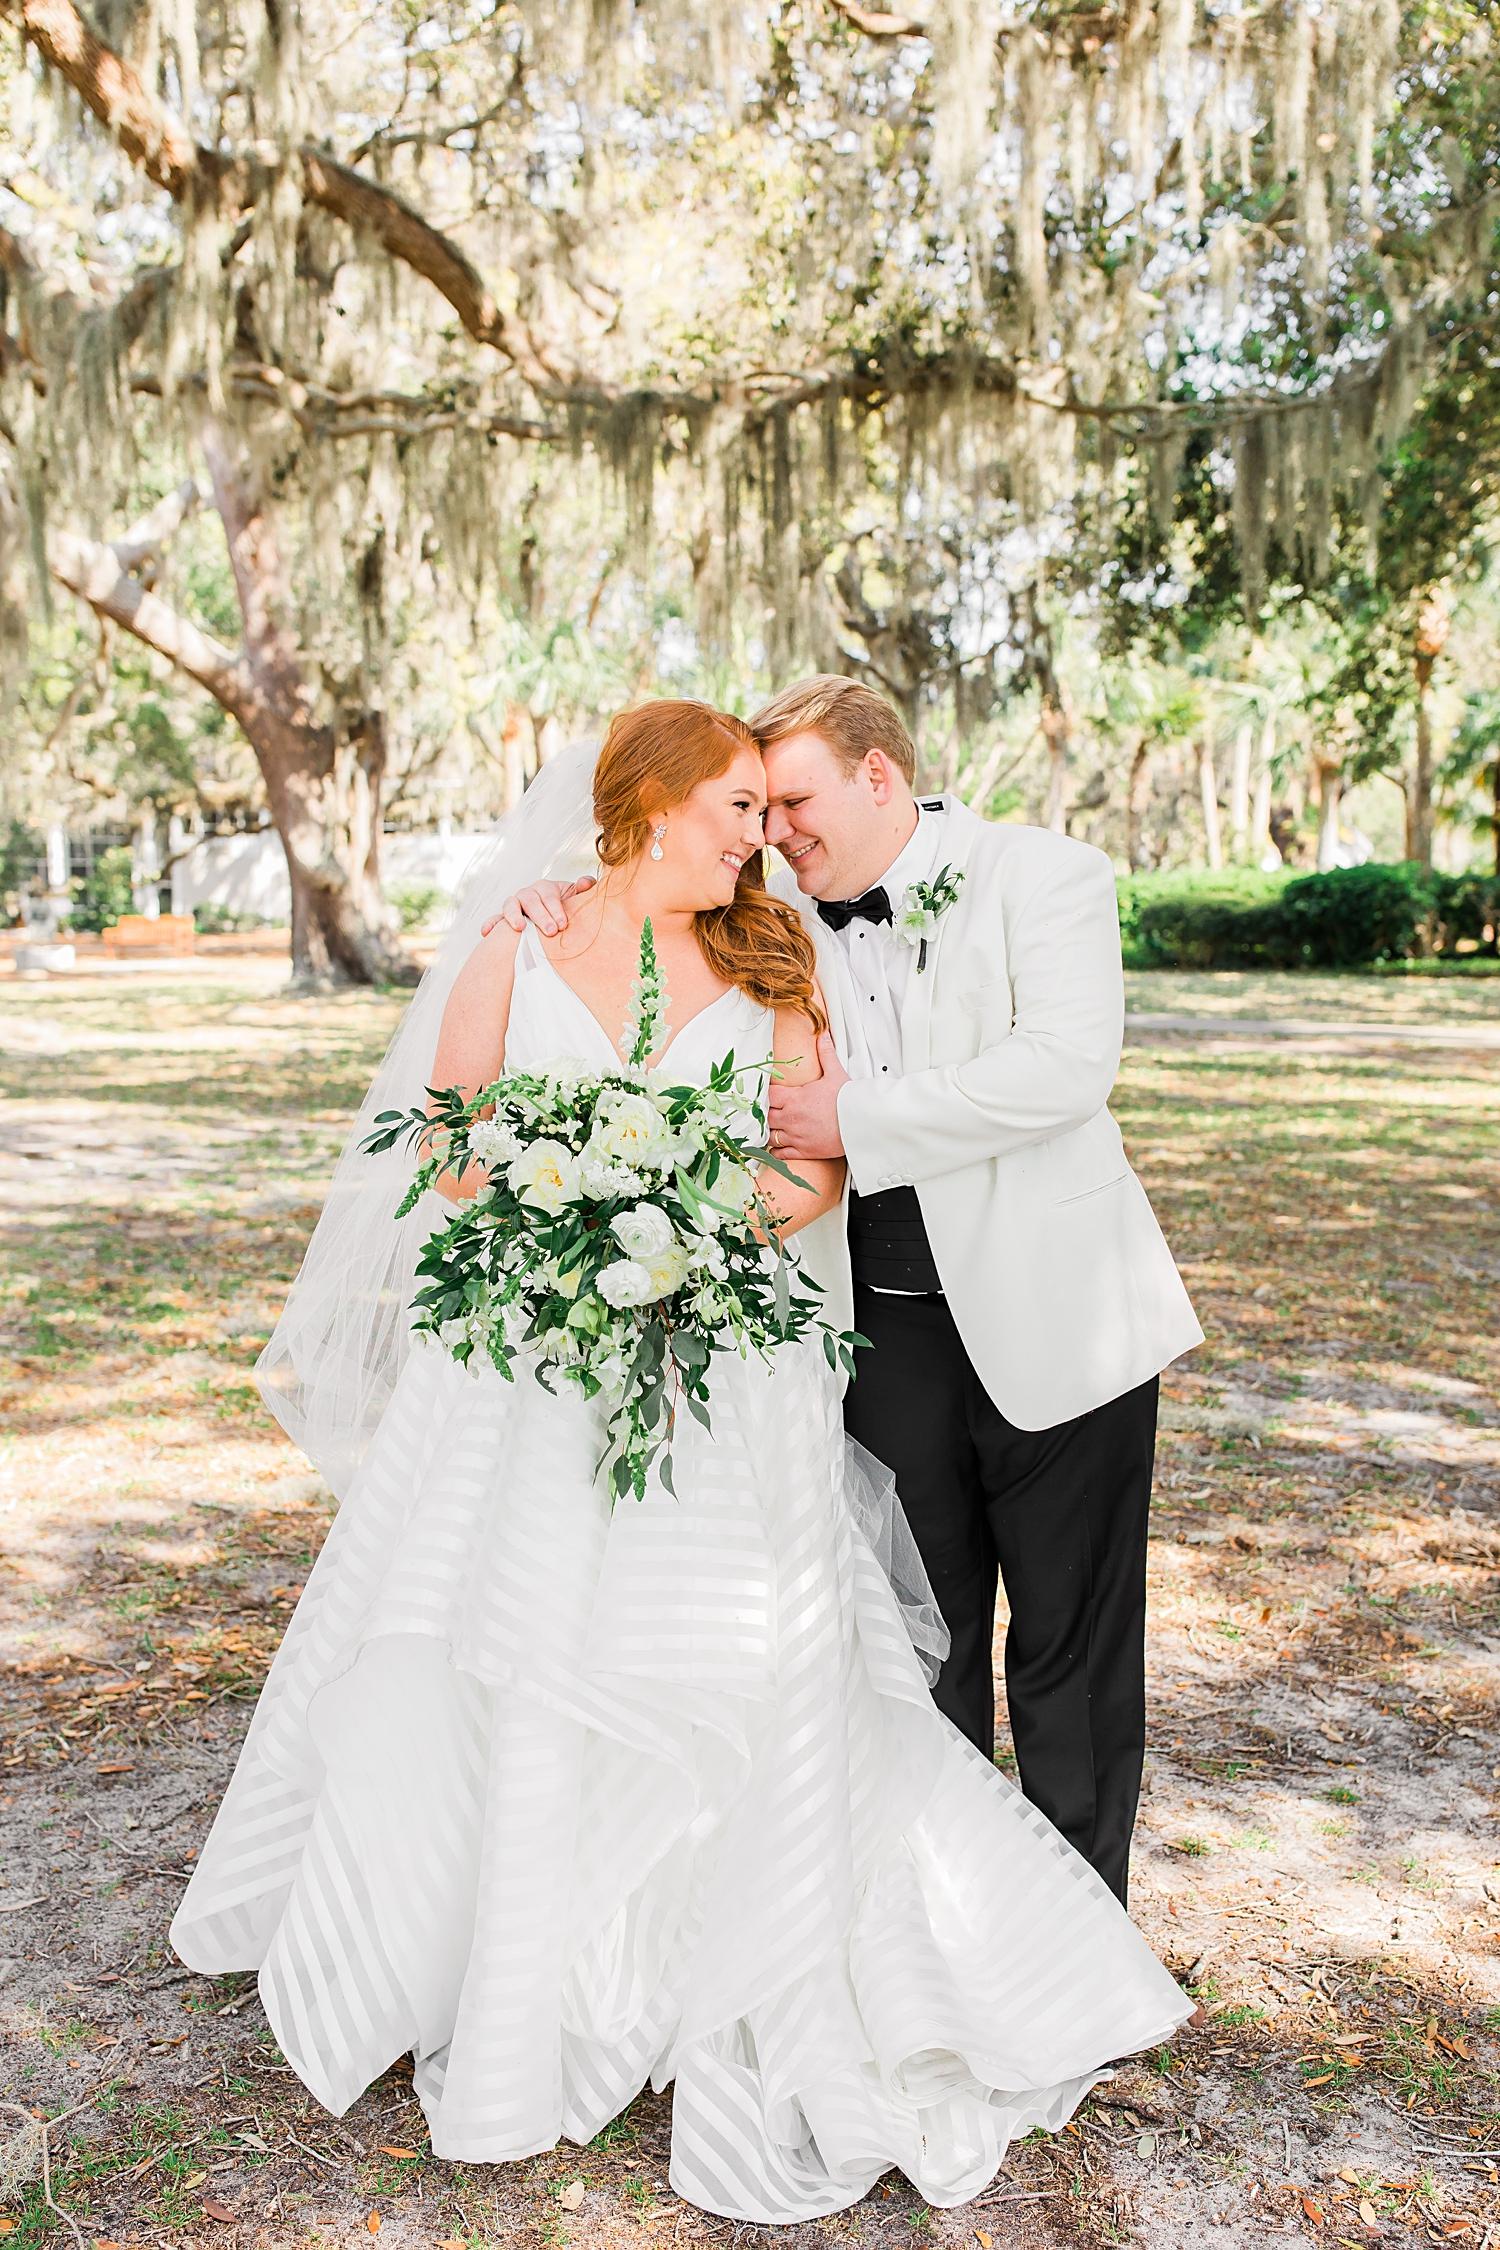 st-simons-island-wedding-photographer-captains-bluff-jb-marie-photography